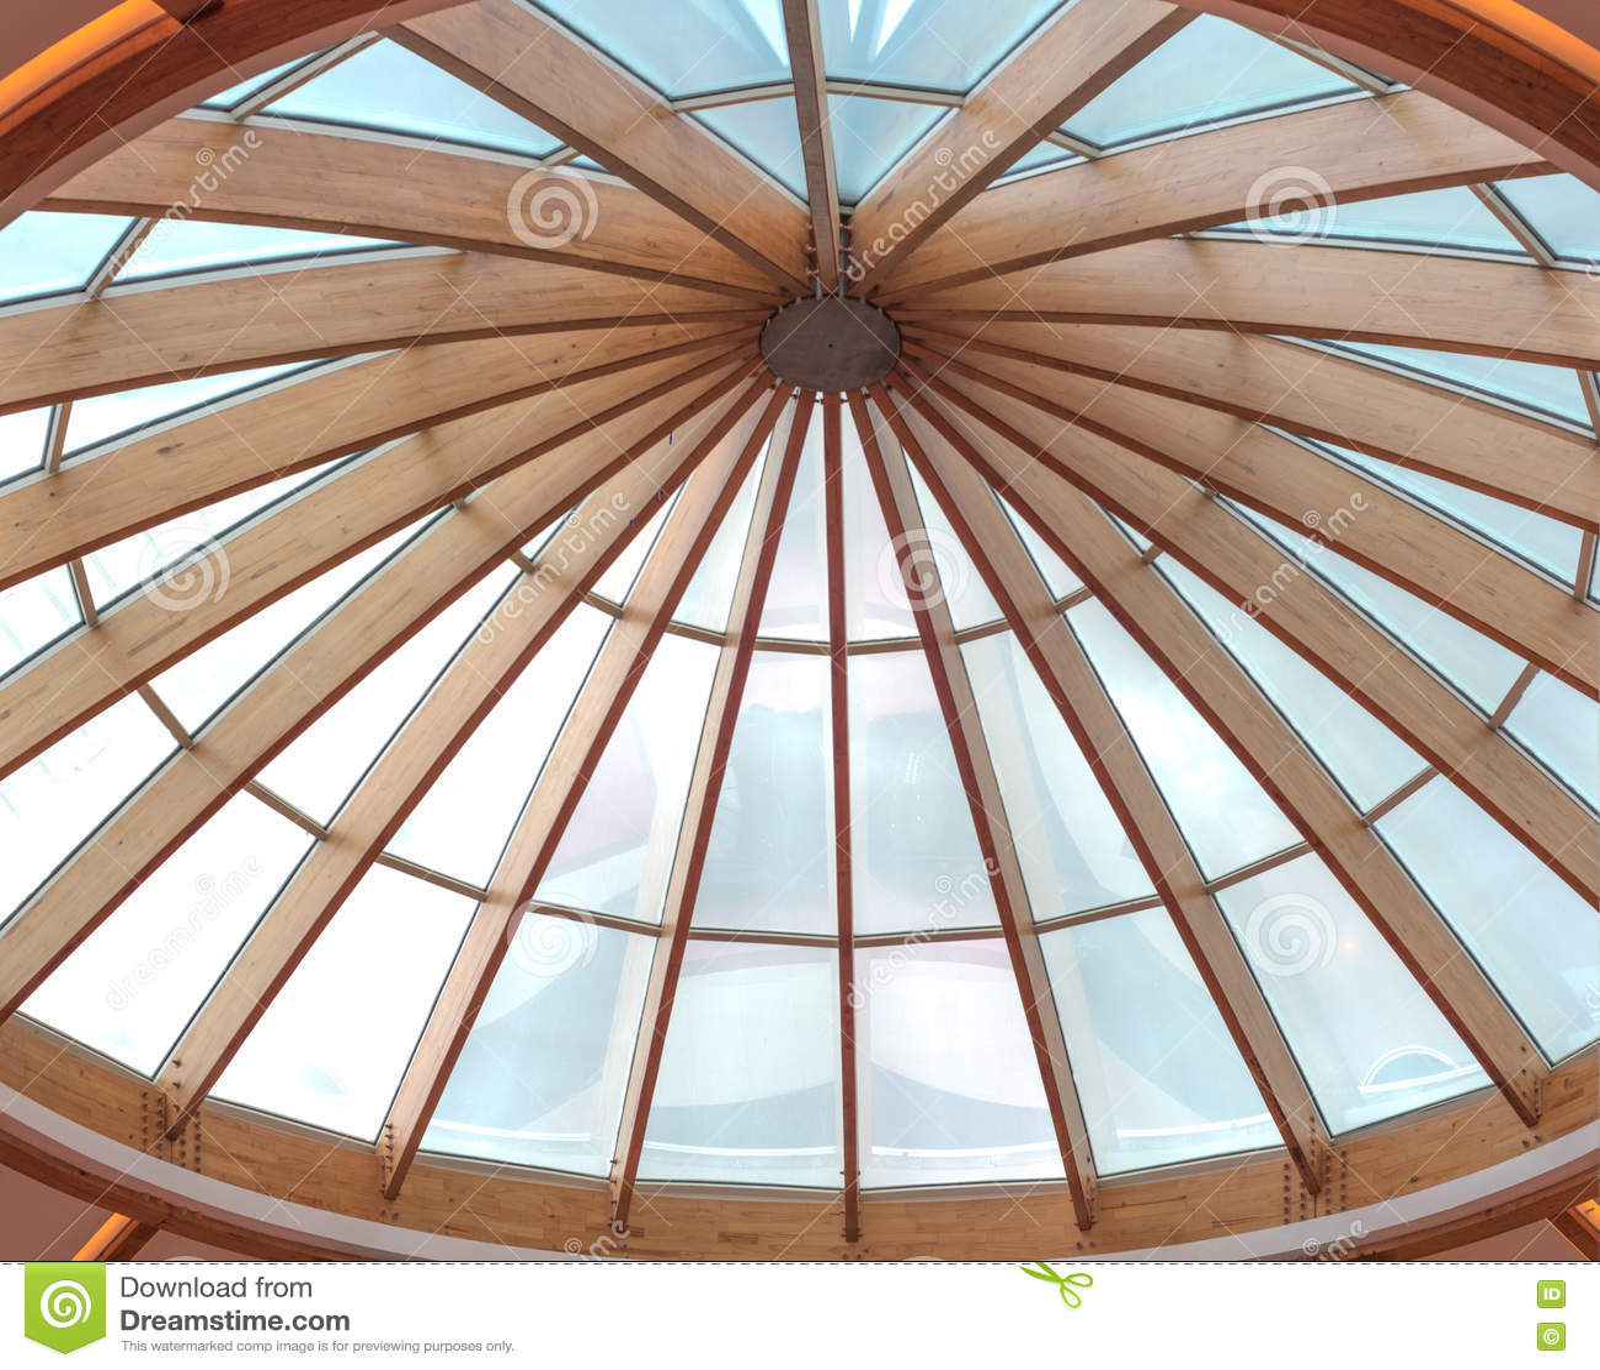 Timber Beams Of A Roof Forming A Circular Skylight Stock